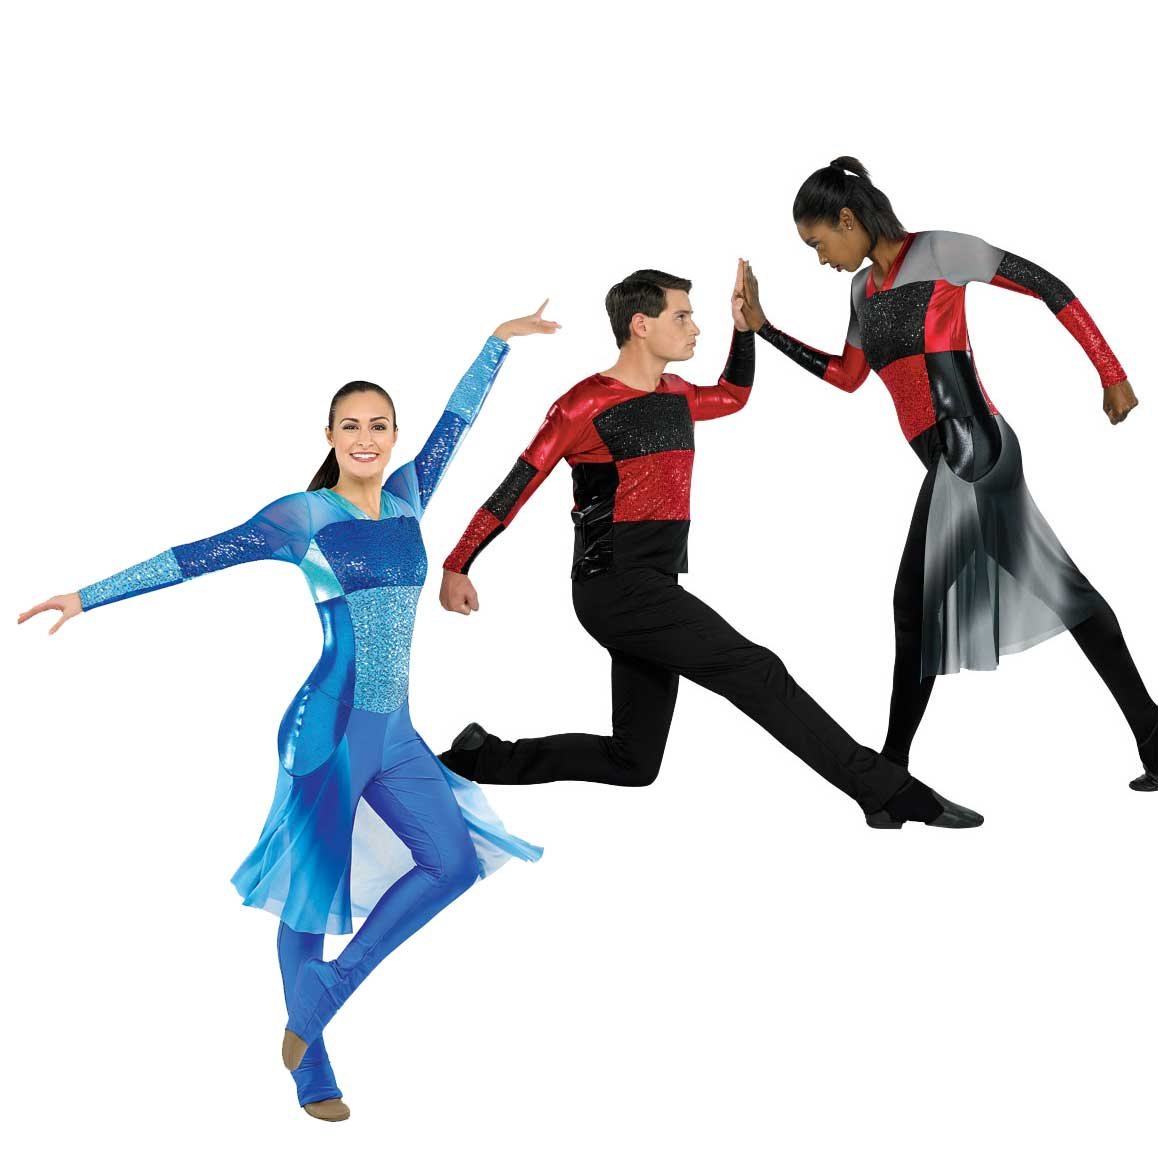 Guard Uniforms: Style 15007